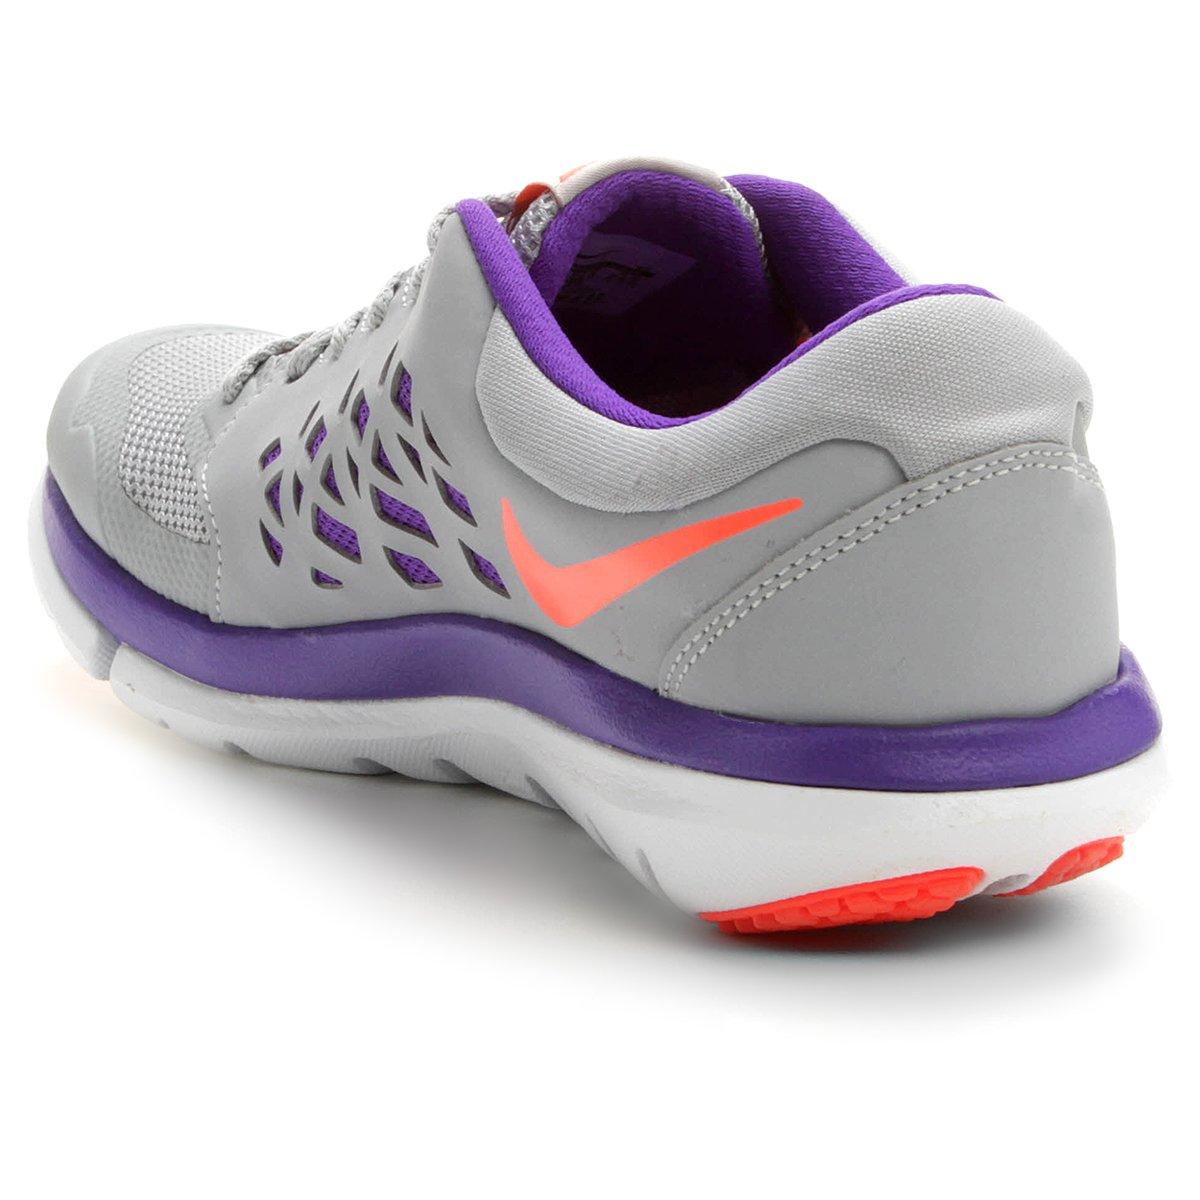 59b66edbeb Tênis Nike Flex 2015 RN MSL Feminino - Compre Agora